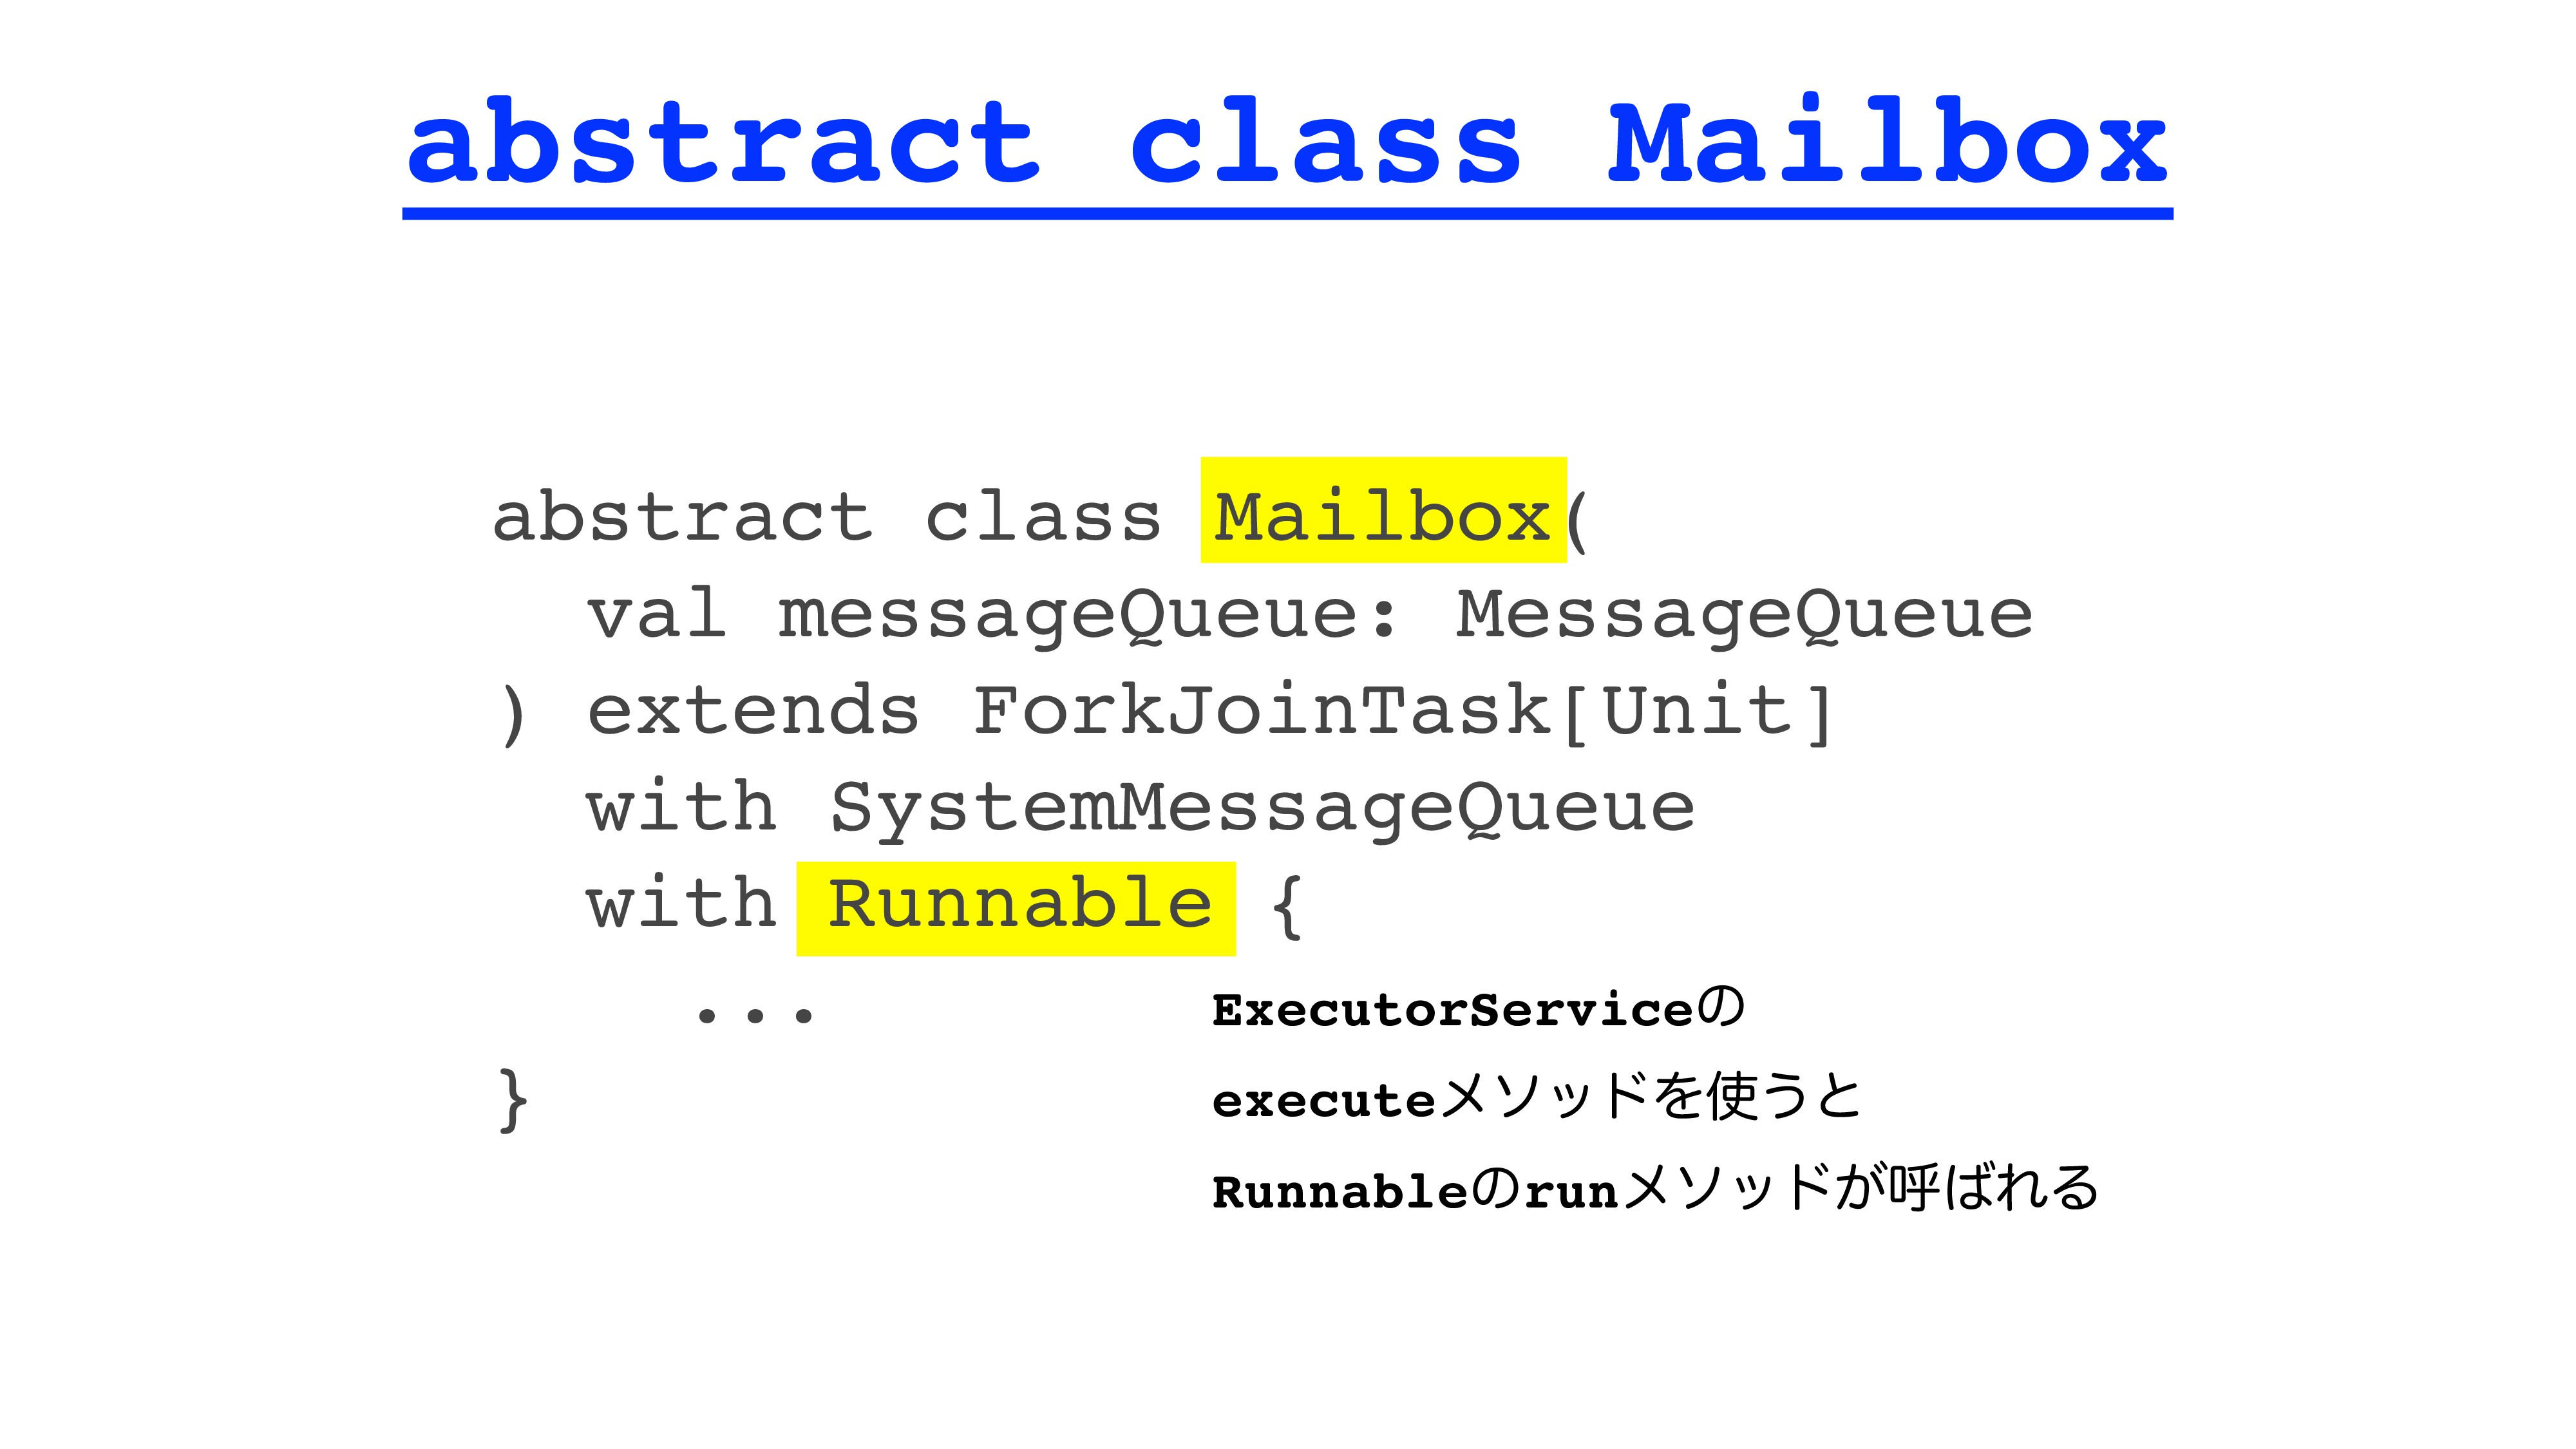 abstract class Mailbox abstract class Mailbox( ...